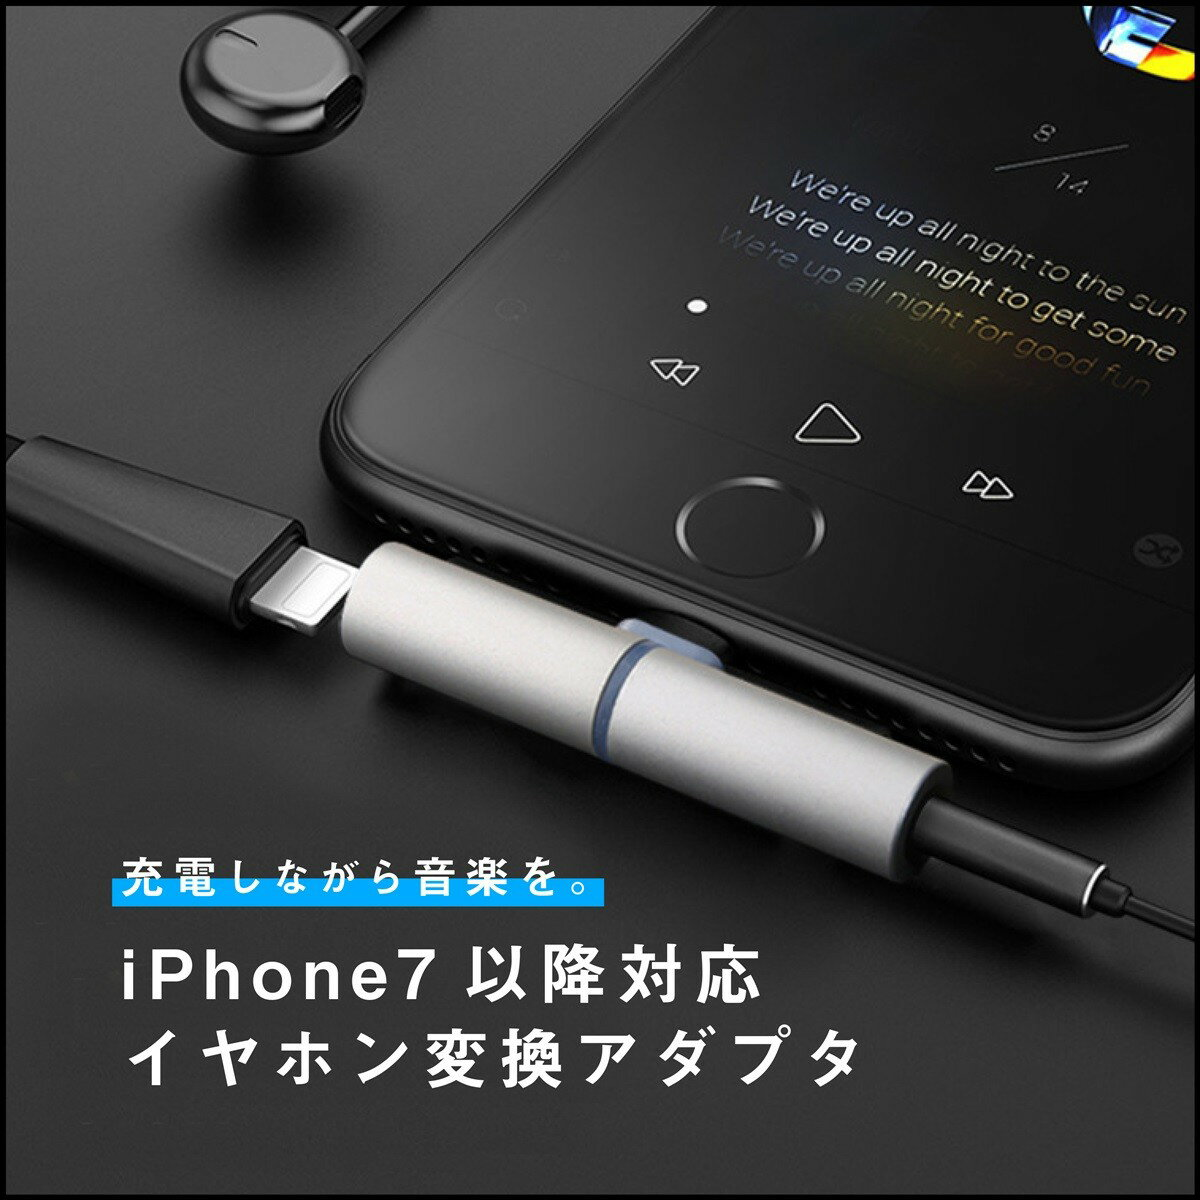 iPhone イヤホン変換 ライトニングケーブル 3.5mm 2in1 変換アダプタ アイフォン 7/7plus iPhone 8/8plus iPhone X 音楽聞きながら充電